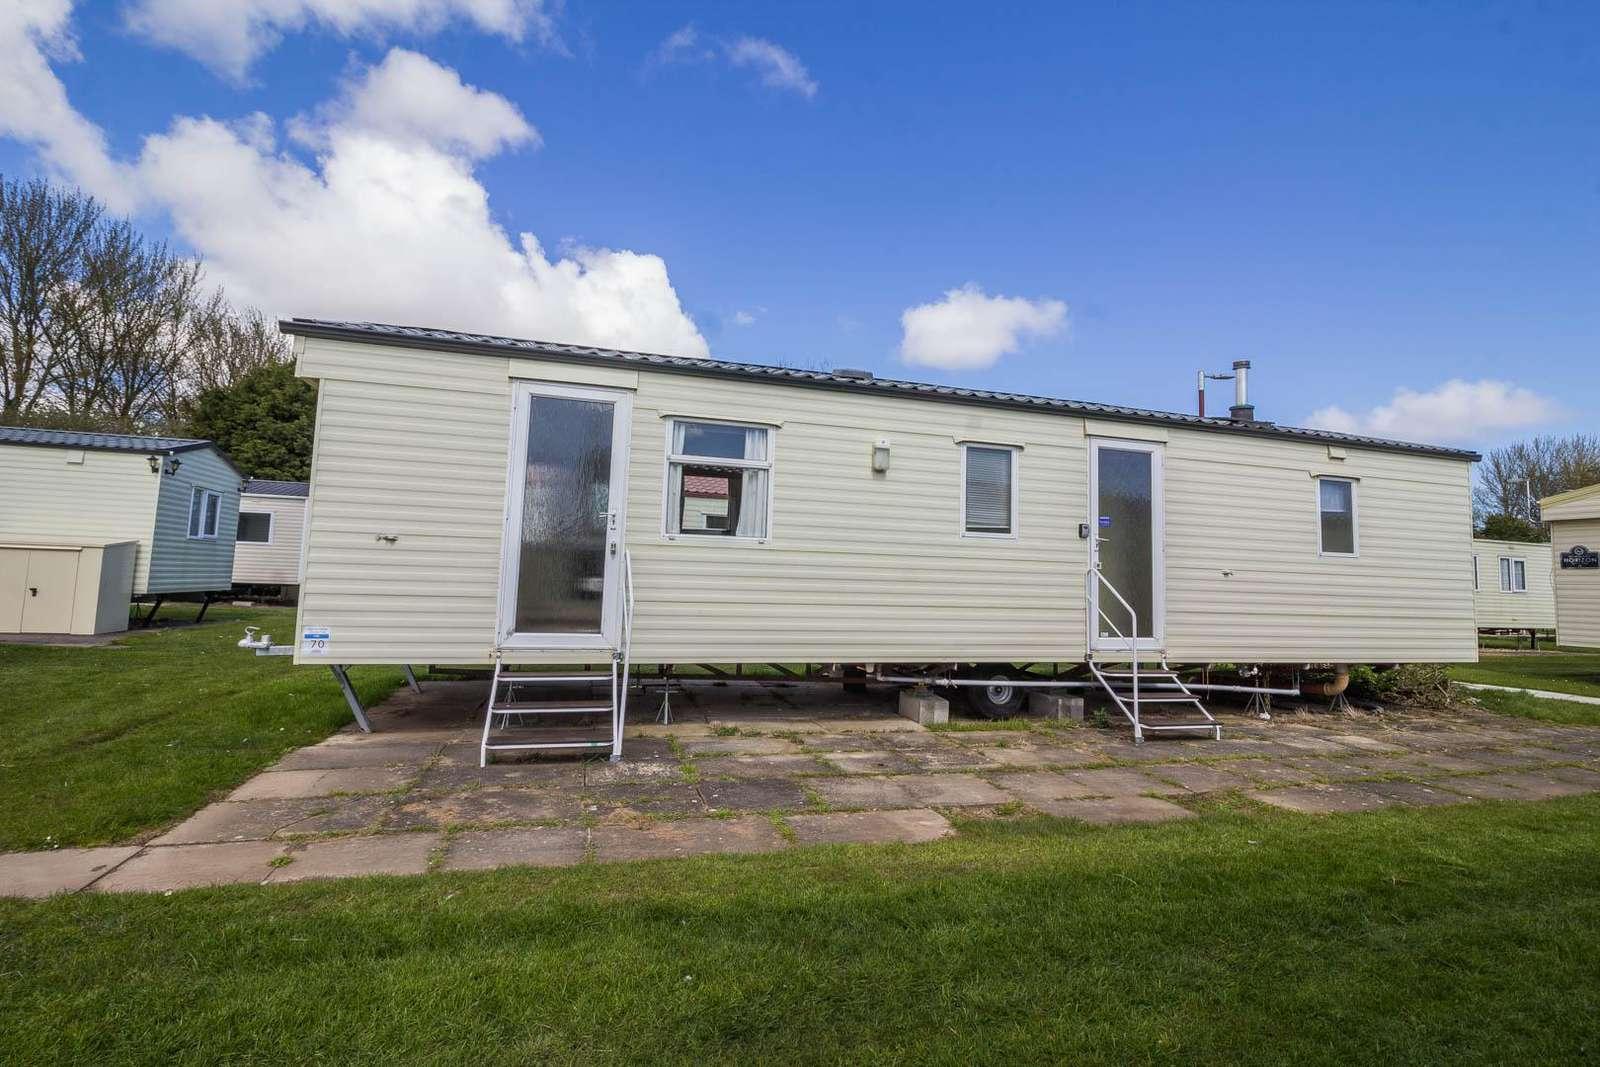 33070F – Firs area, 3 bed, 8 berth caravan. Emerald rated. - property